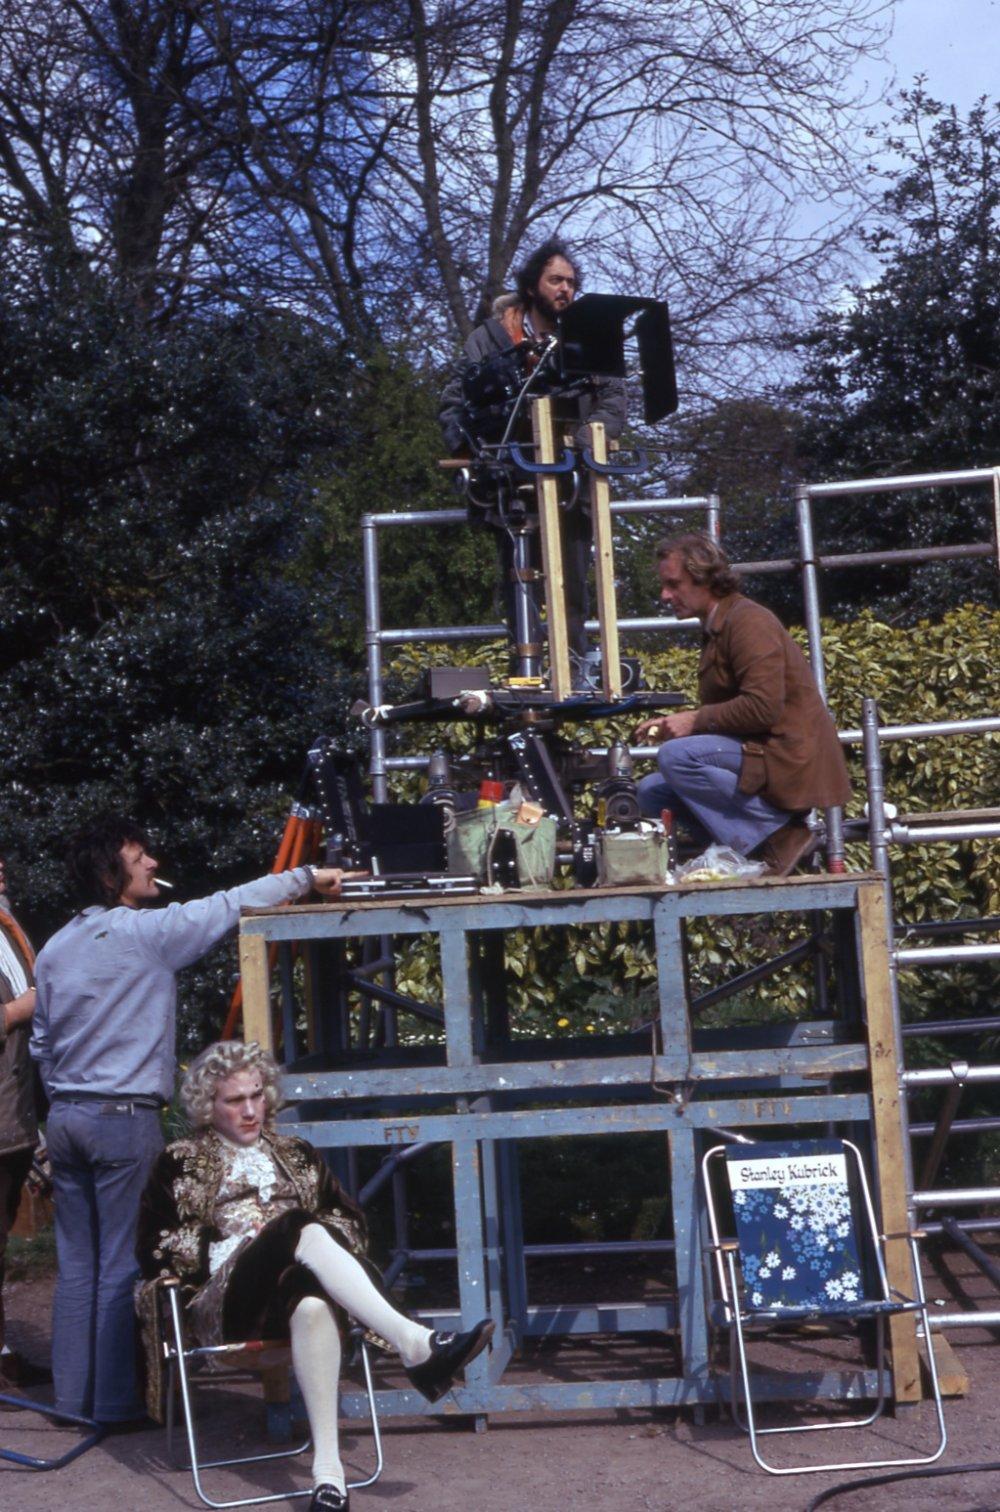 barry-lyndon-filming-9.jpg